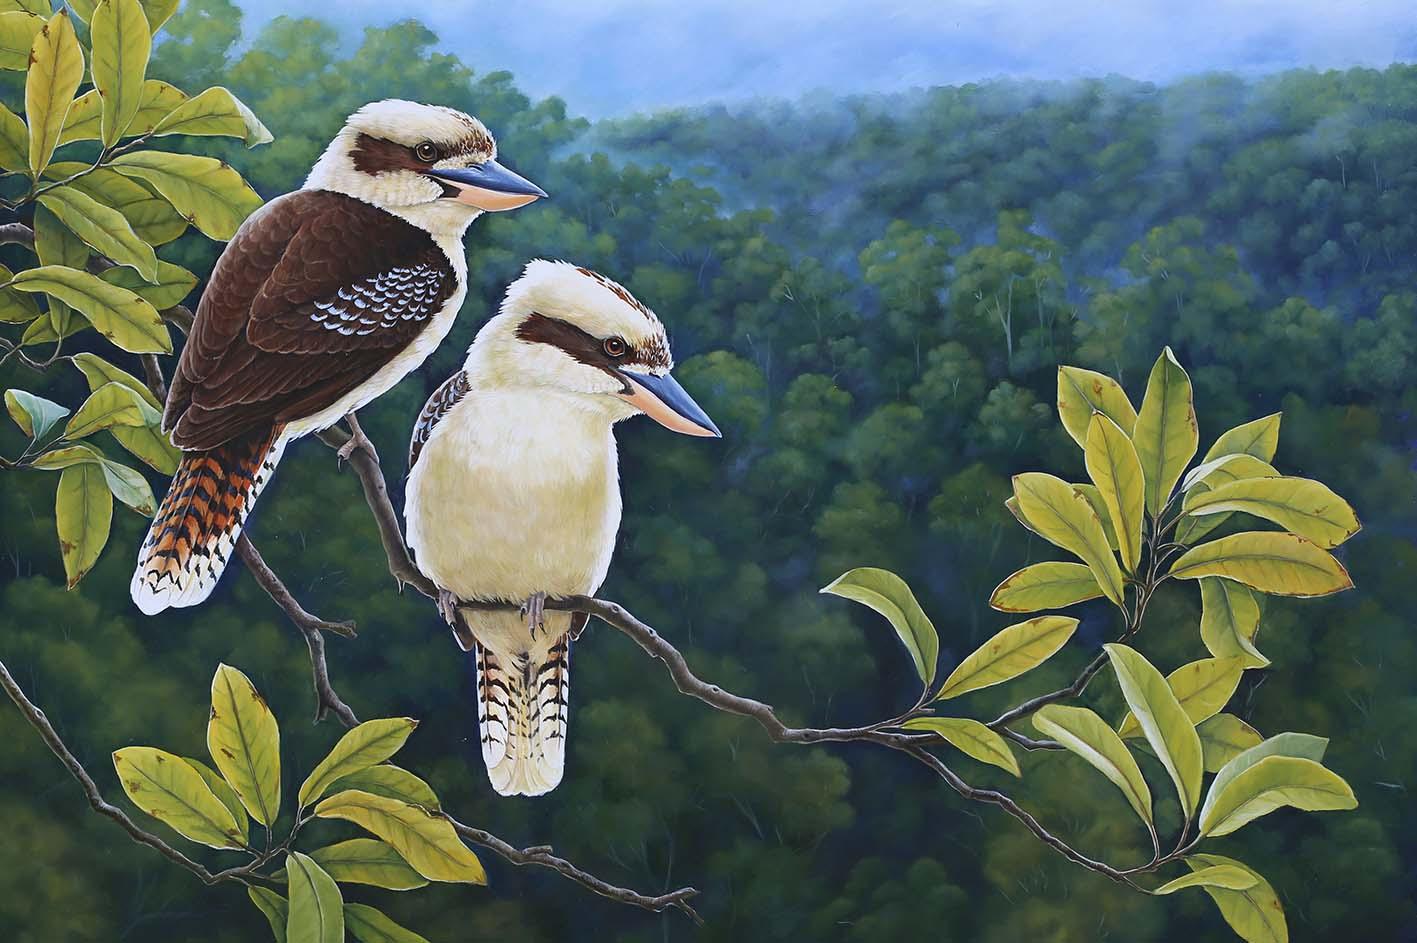 Before the Rain - Kookaburras